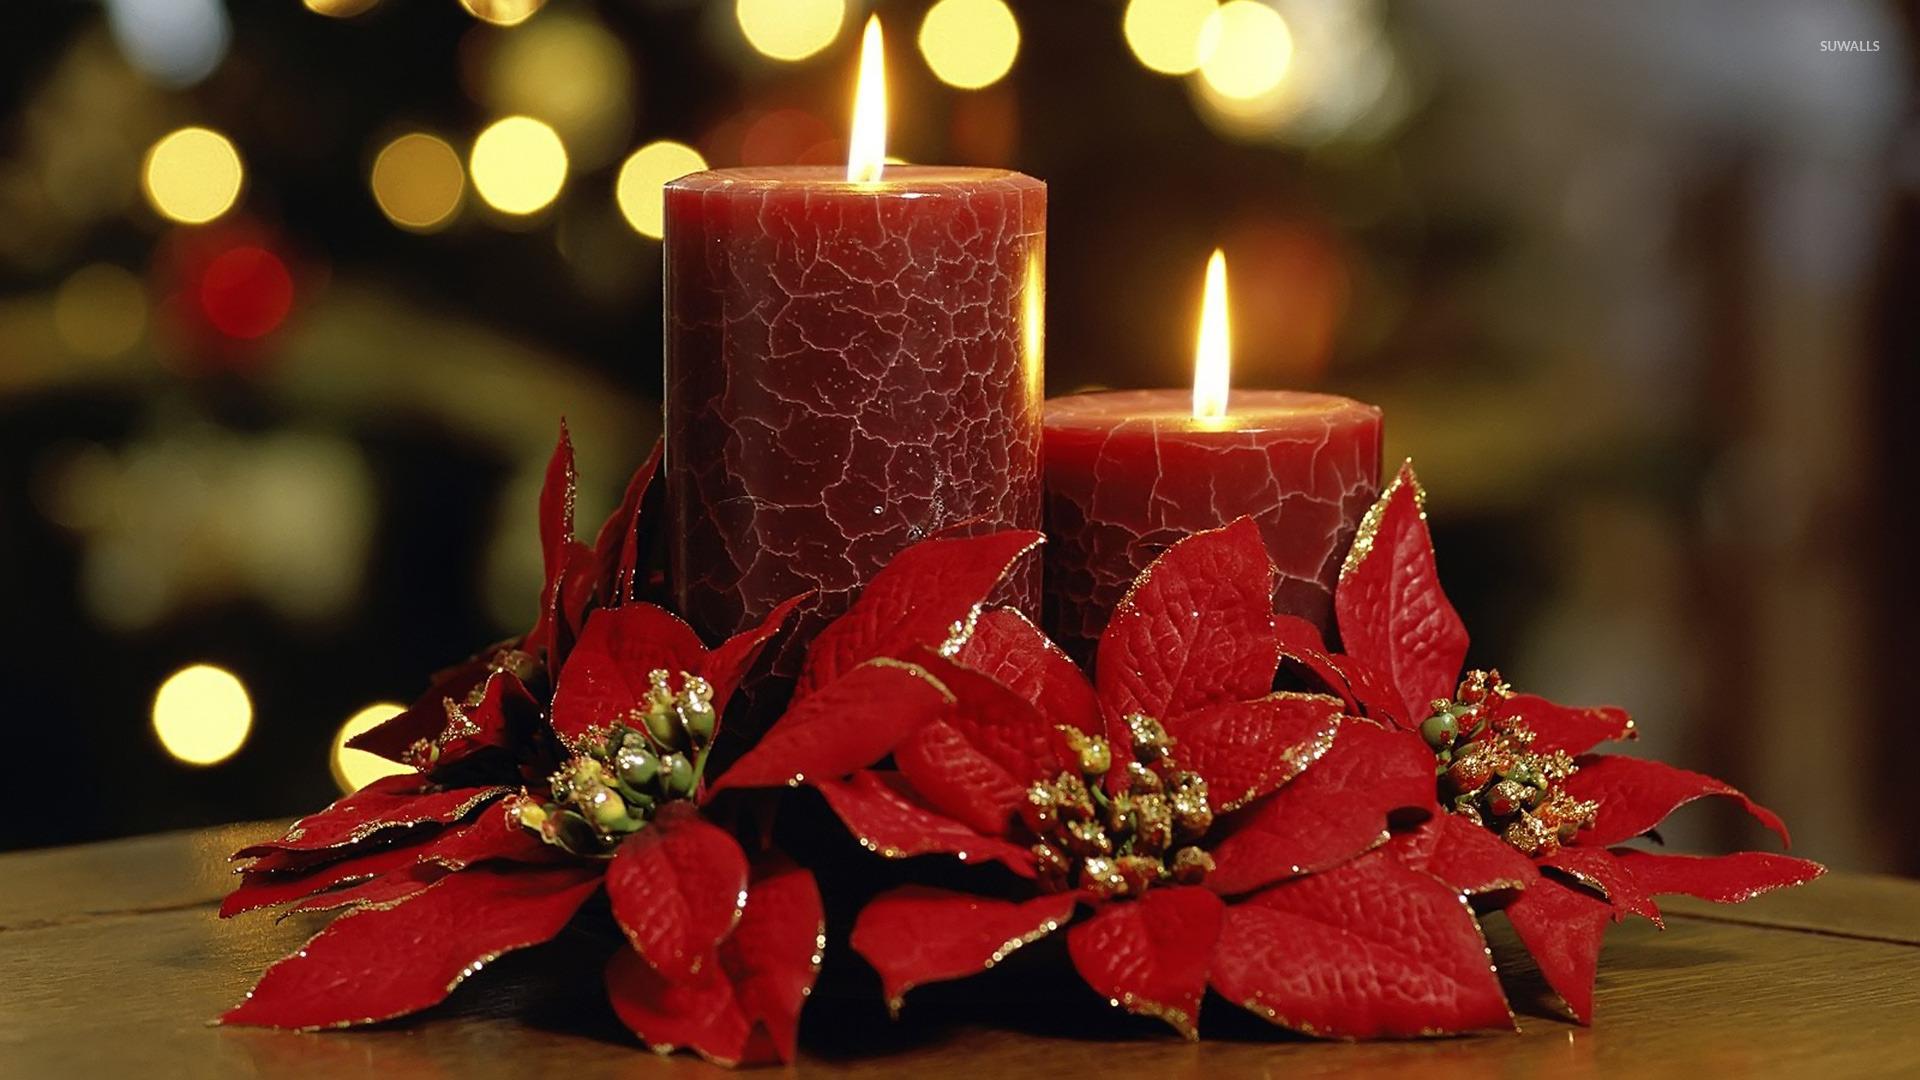 Christmas candles wallpaper - Holiday wallpapers - #9802